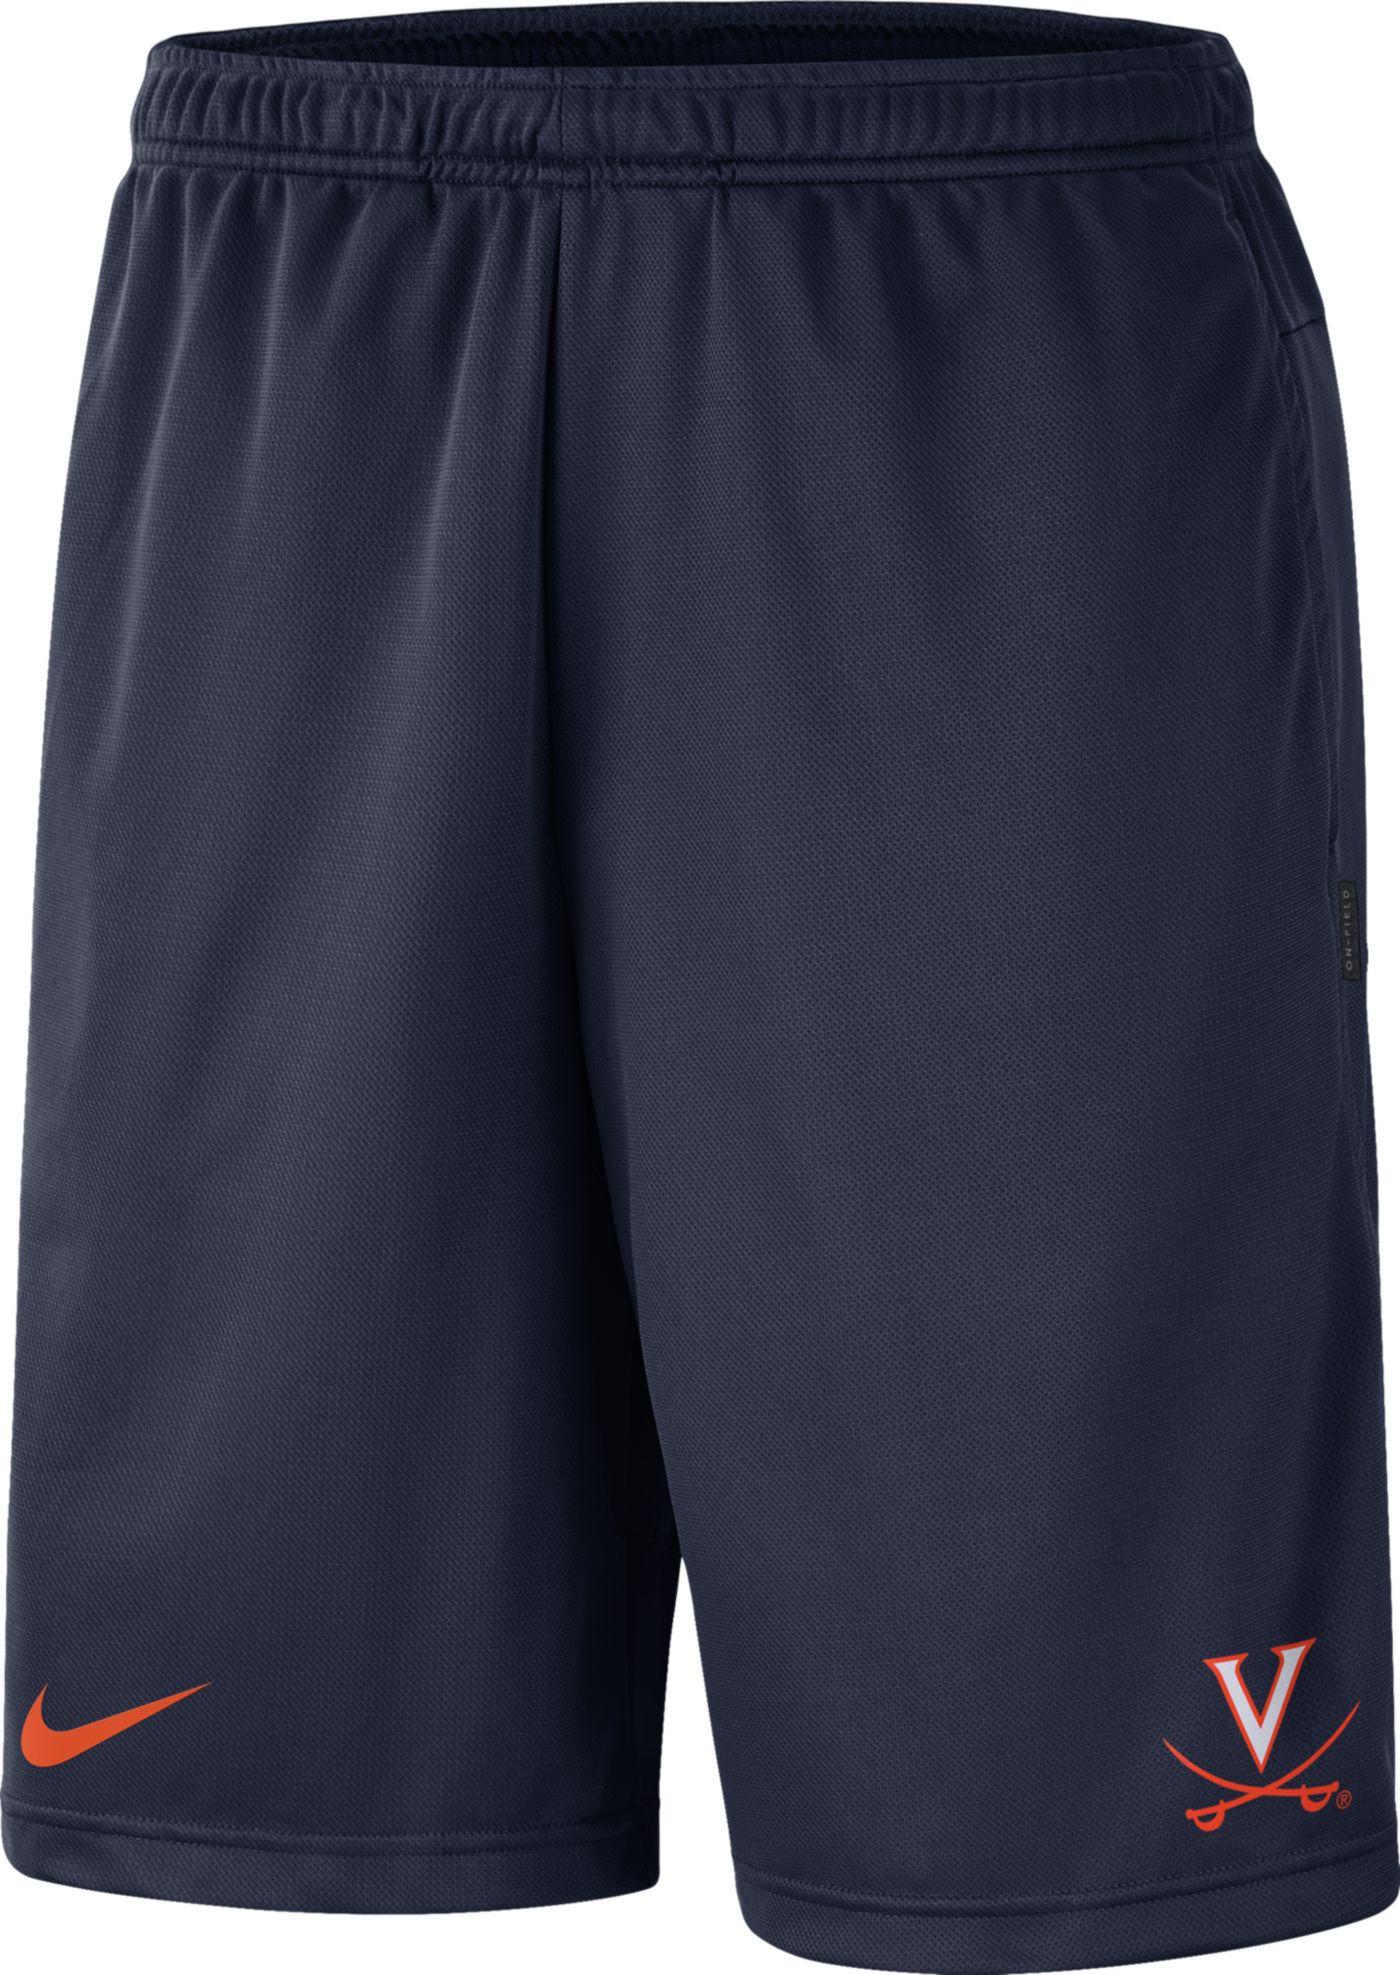 Nike Men's Virginia Cavaliers Blue Dri-FIT Coach Shorts